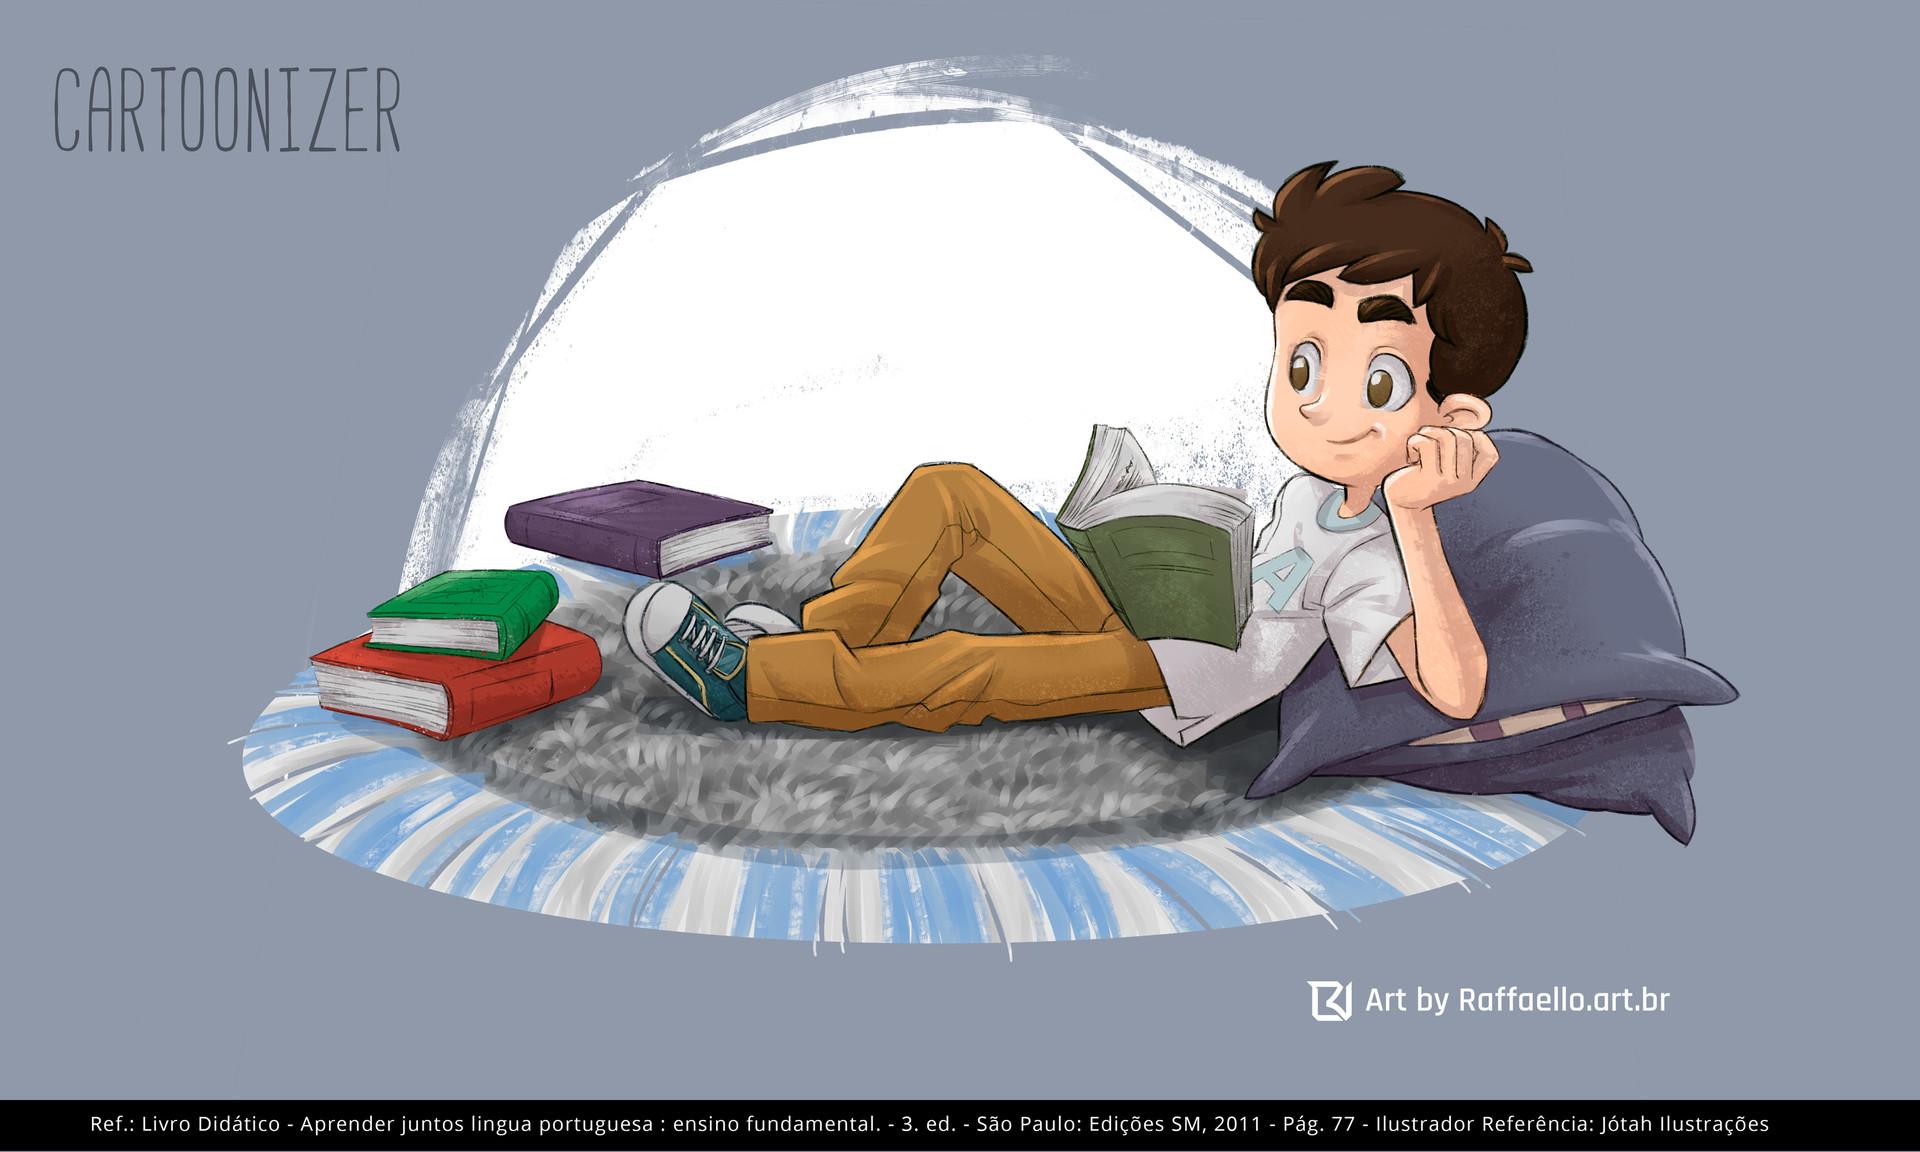 Luiz raffaello cartoonizer02